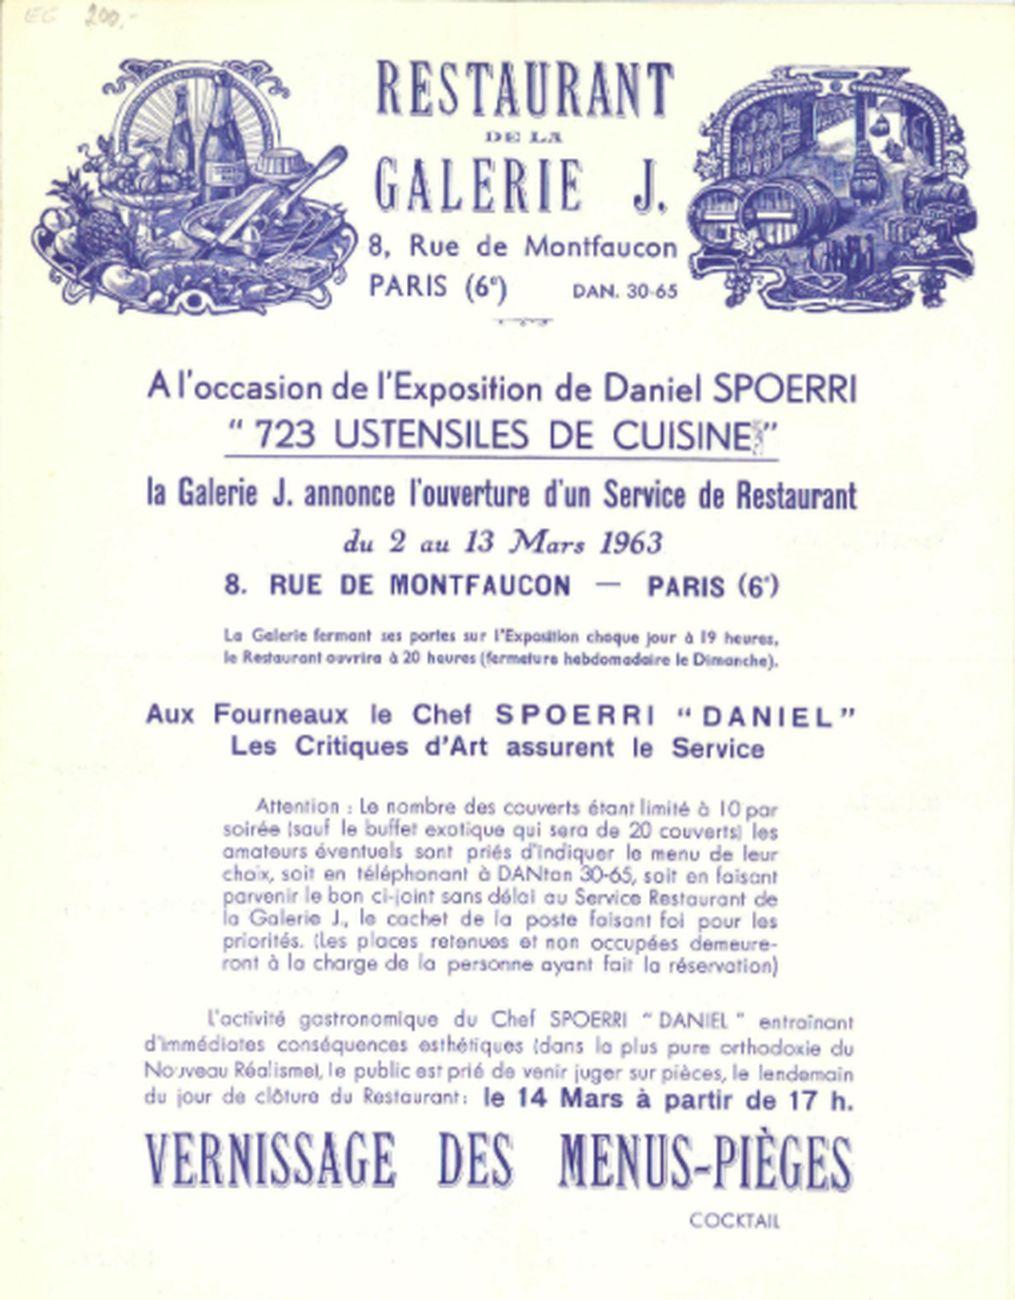 Daniel Spoerri, invitation-menu. Restaurant de la Galerie J. Paris, Galerie J, Parigi 1963. Archiv der Avantgarden, Staatliche Kunstsammlungen, Dresda © VG Bild-Kunst, Bonn